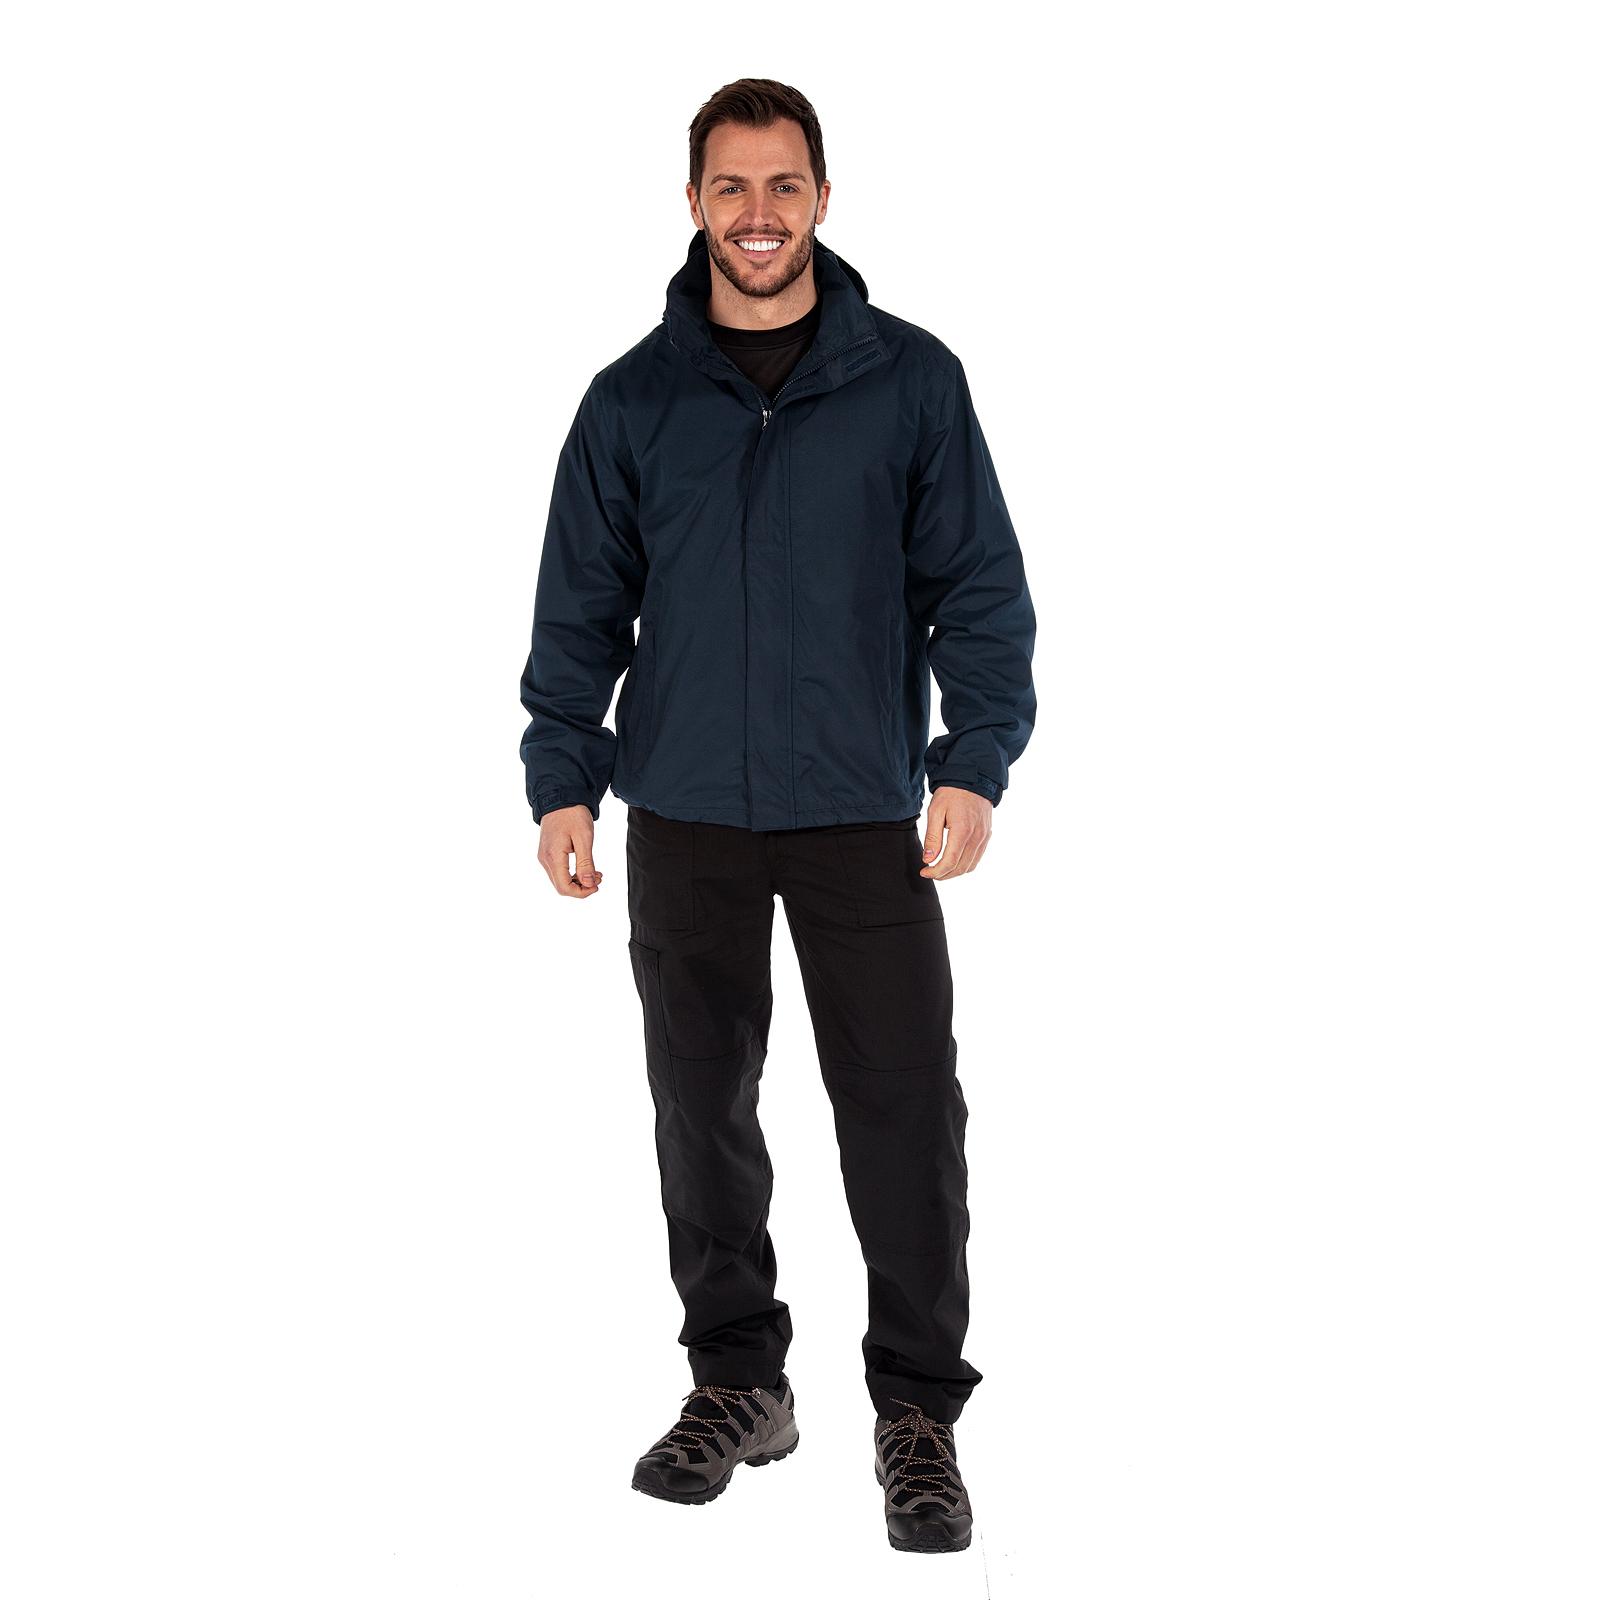 6d74a35f5a7 CENTINELA regata Ritmo II lleno de Mens chaqueta impermeable ligera mangas  con cremallera con capucha